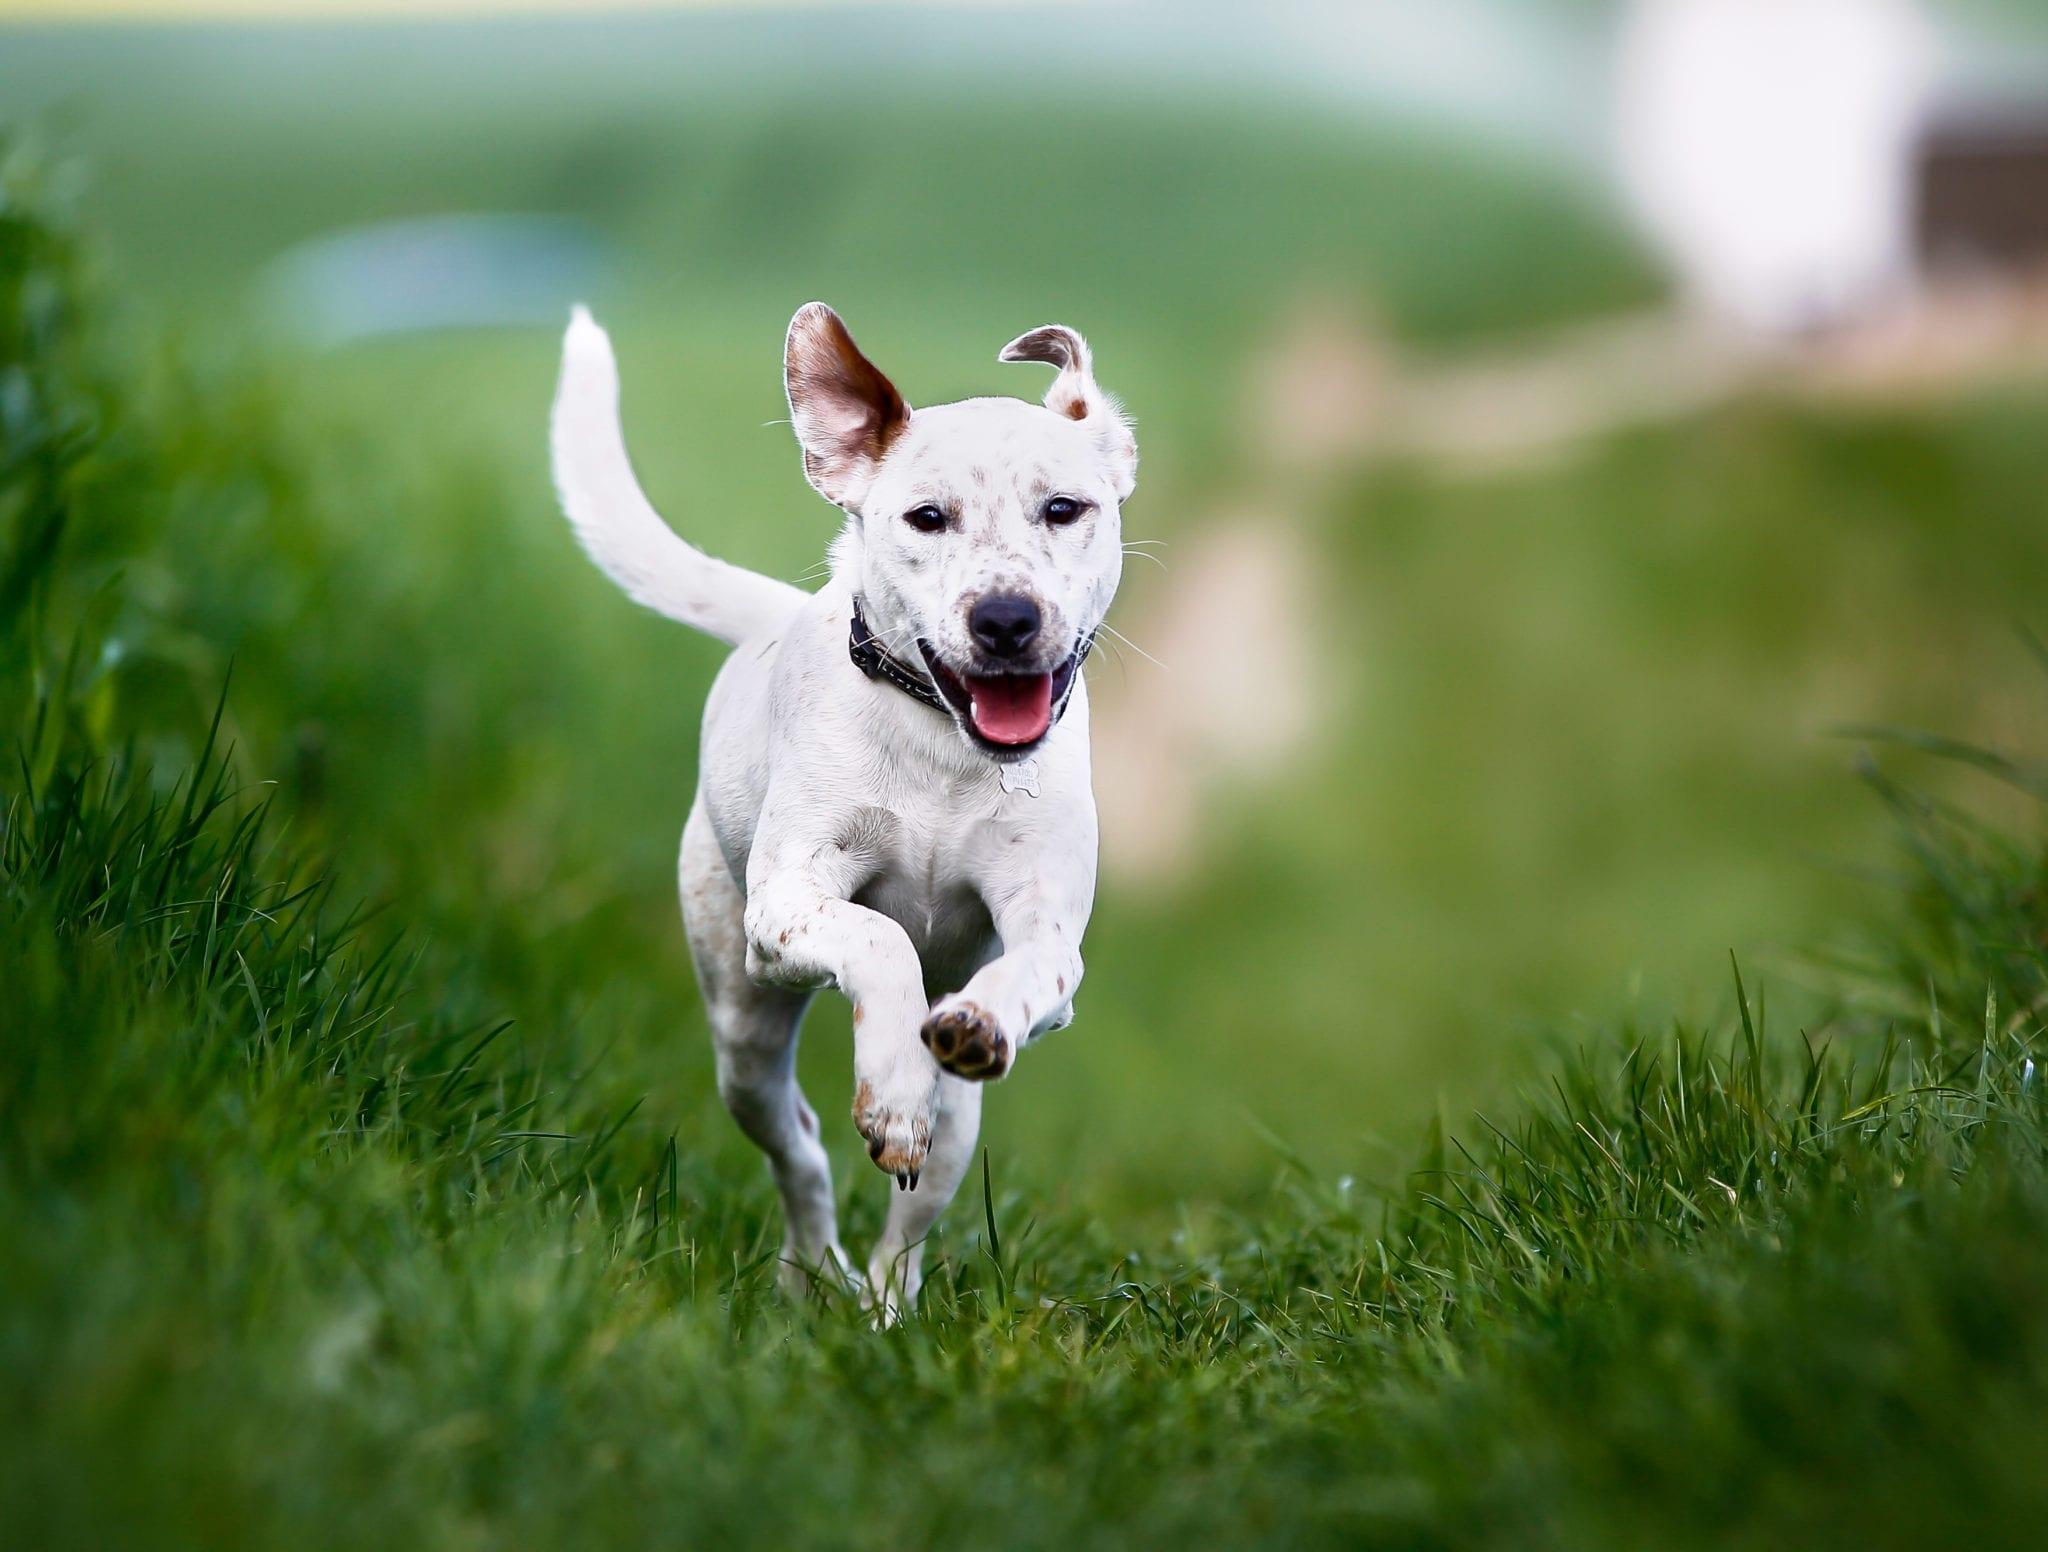 Giving dogs daily CBD improves their arthritis: study